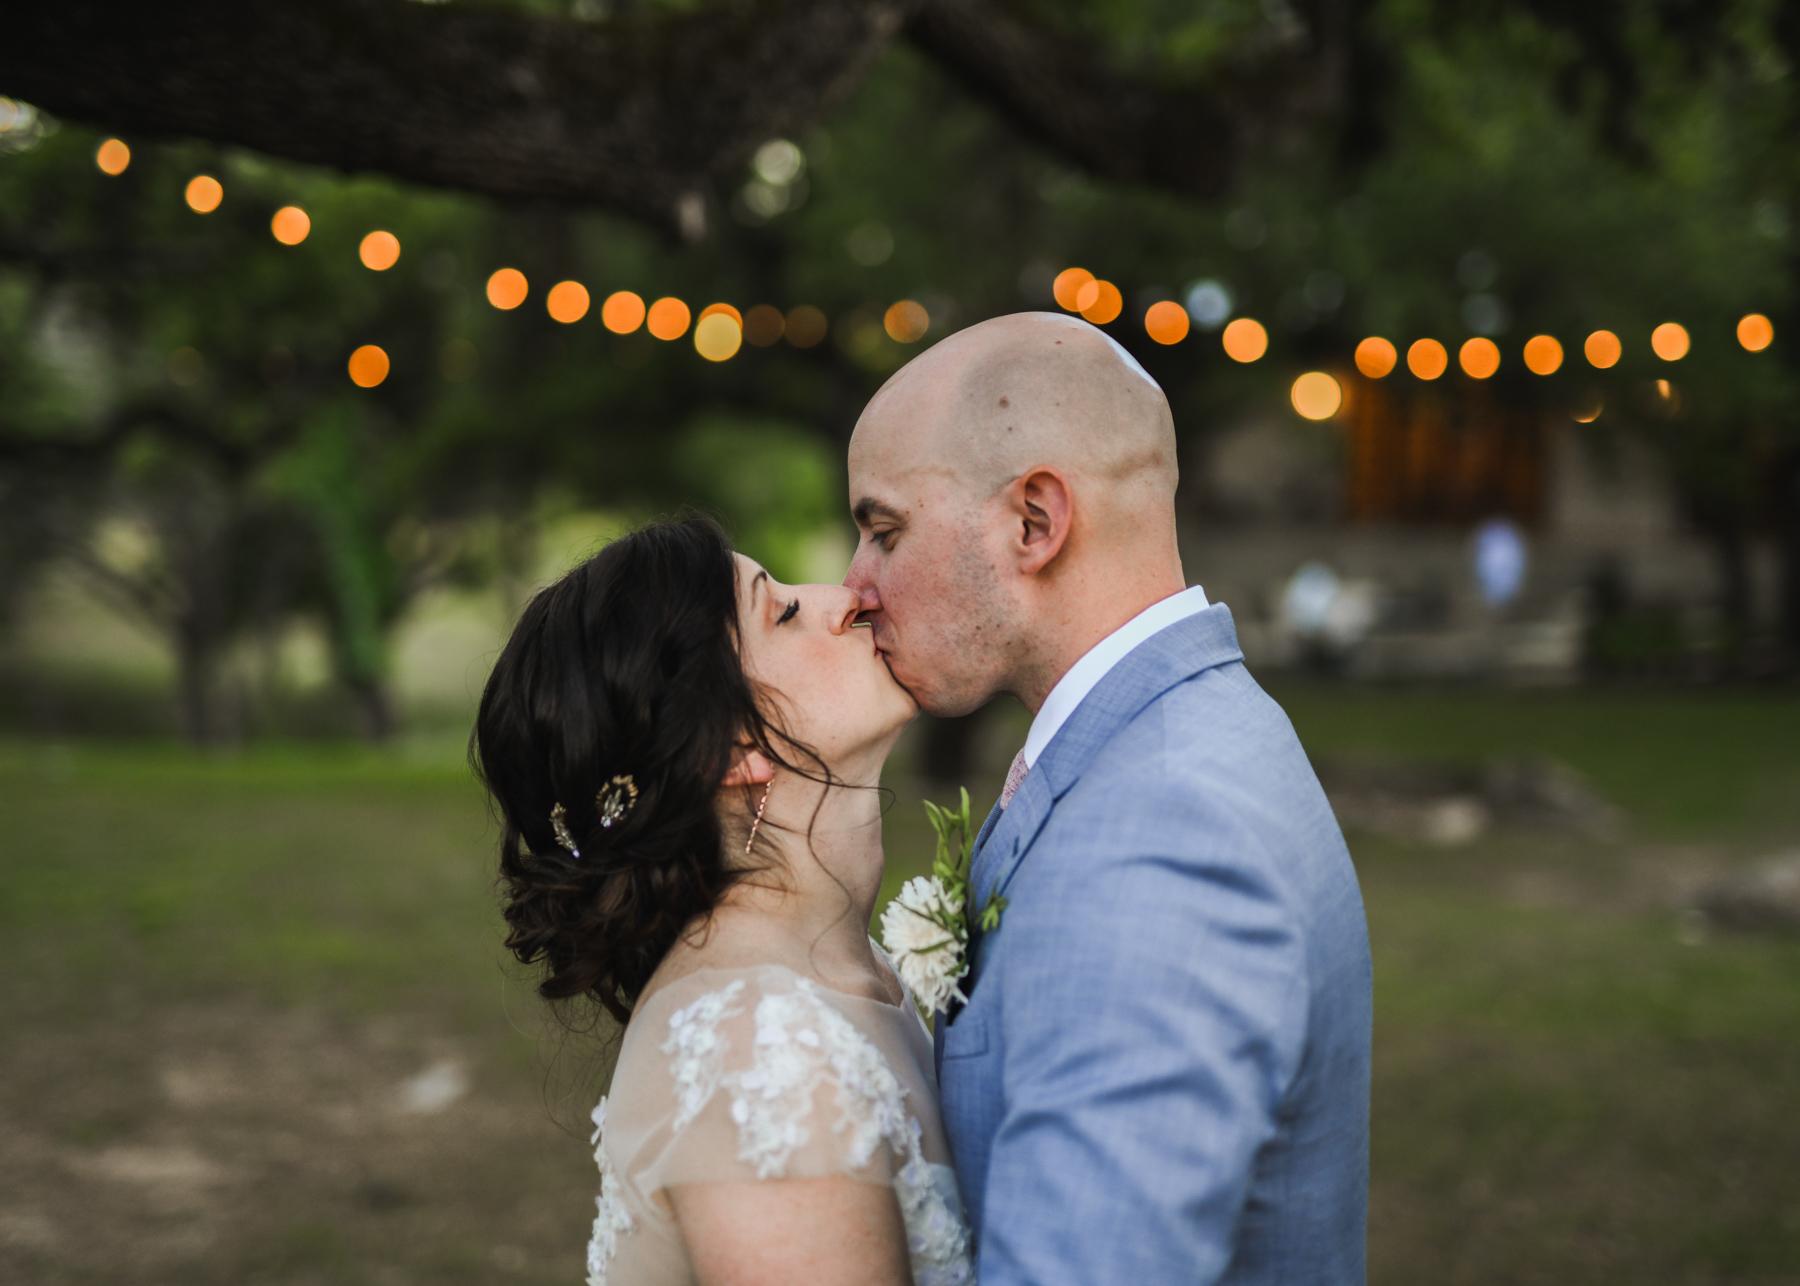 oklahoma city wedding photographer austin texas scissortial stories-132.jpg